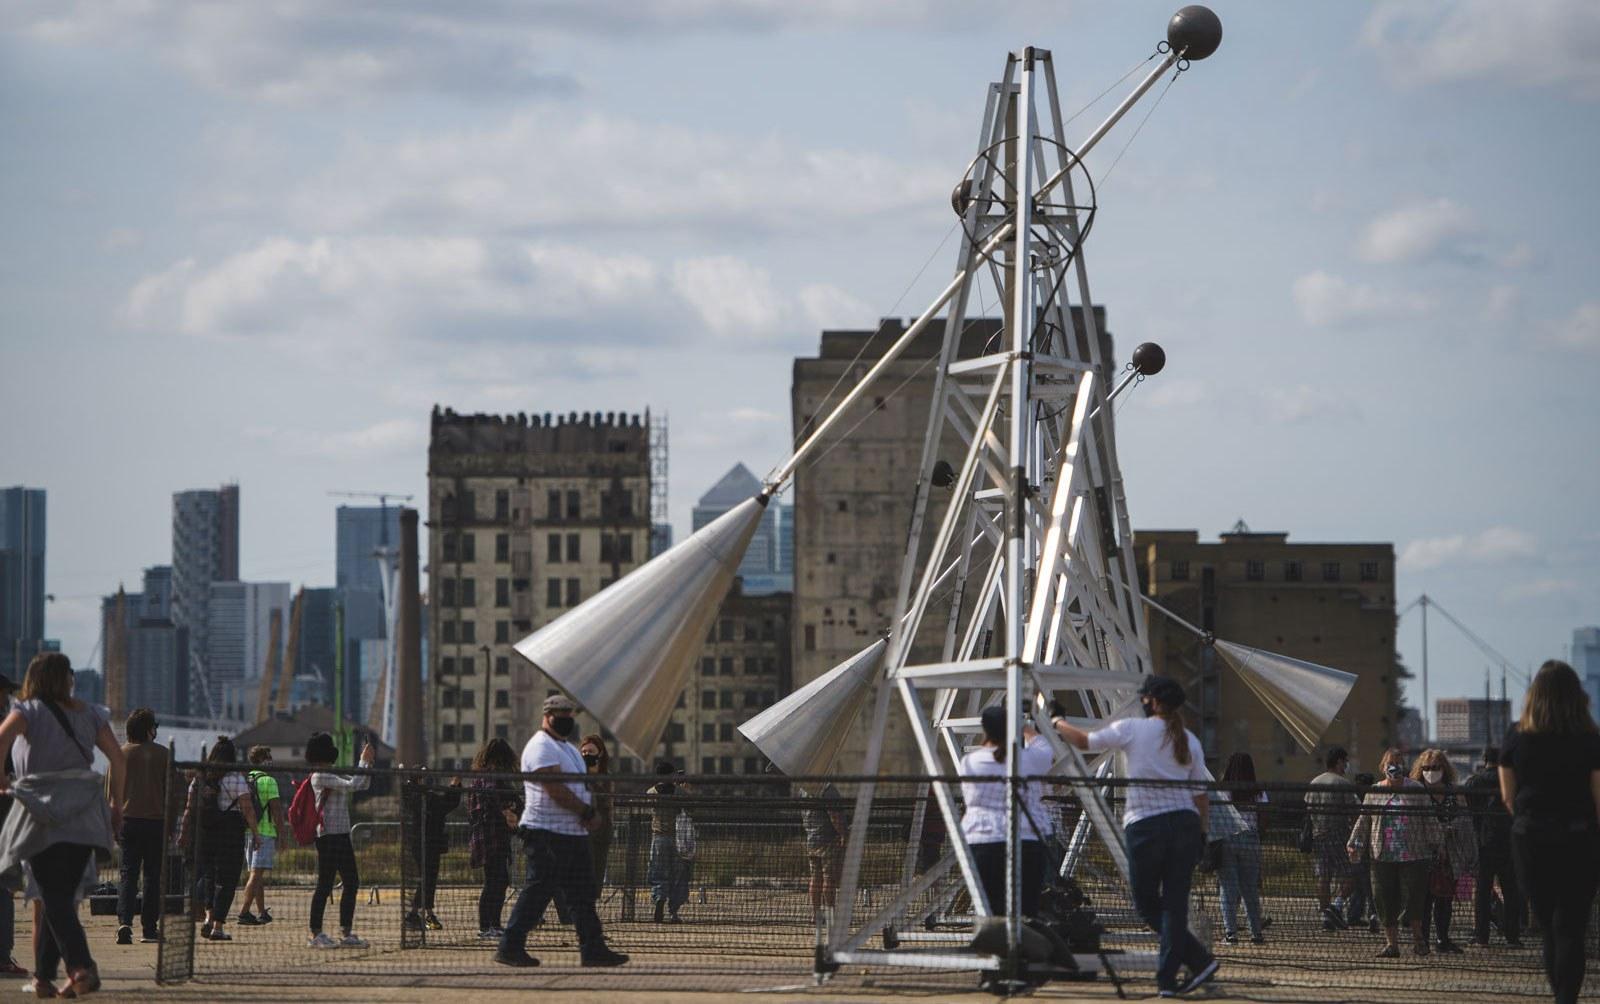 Image shows installation art at the Royal Docks